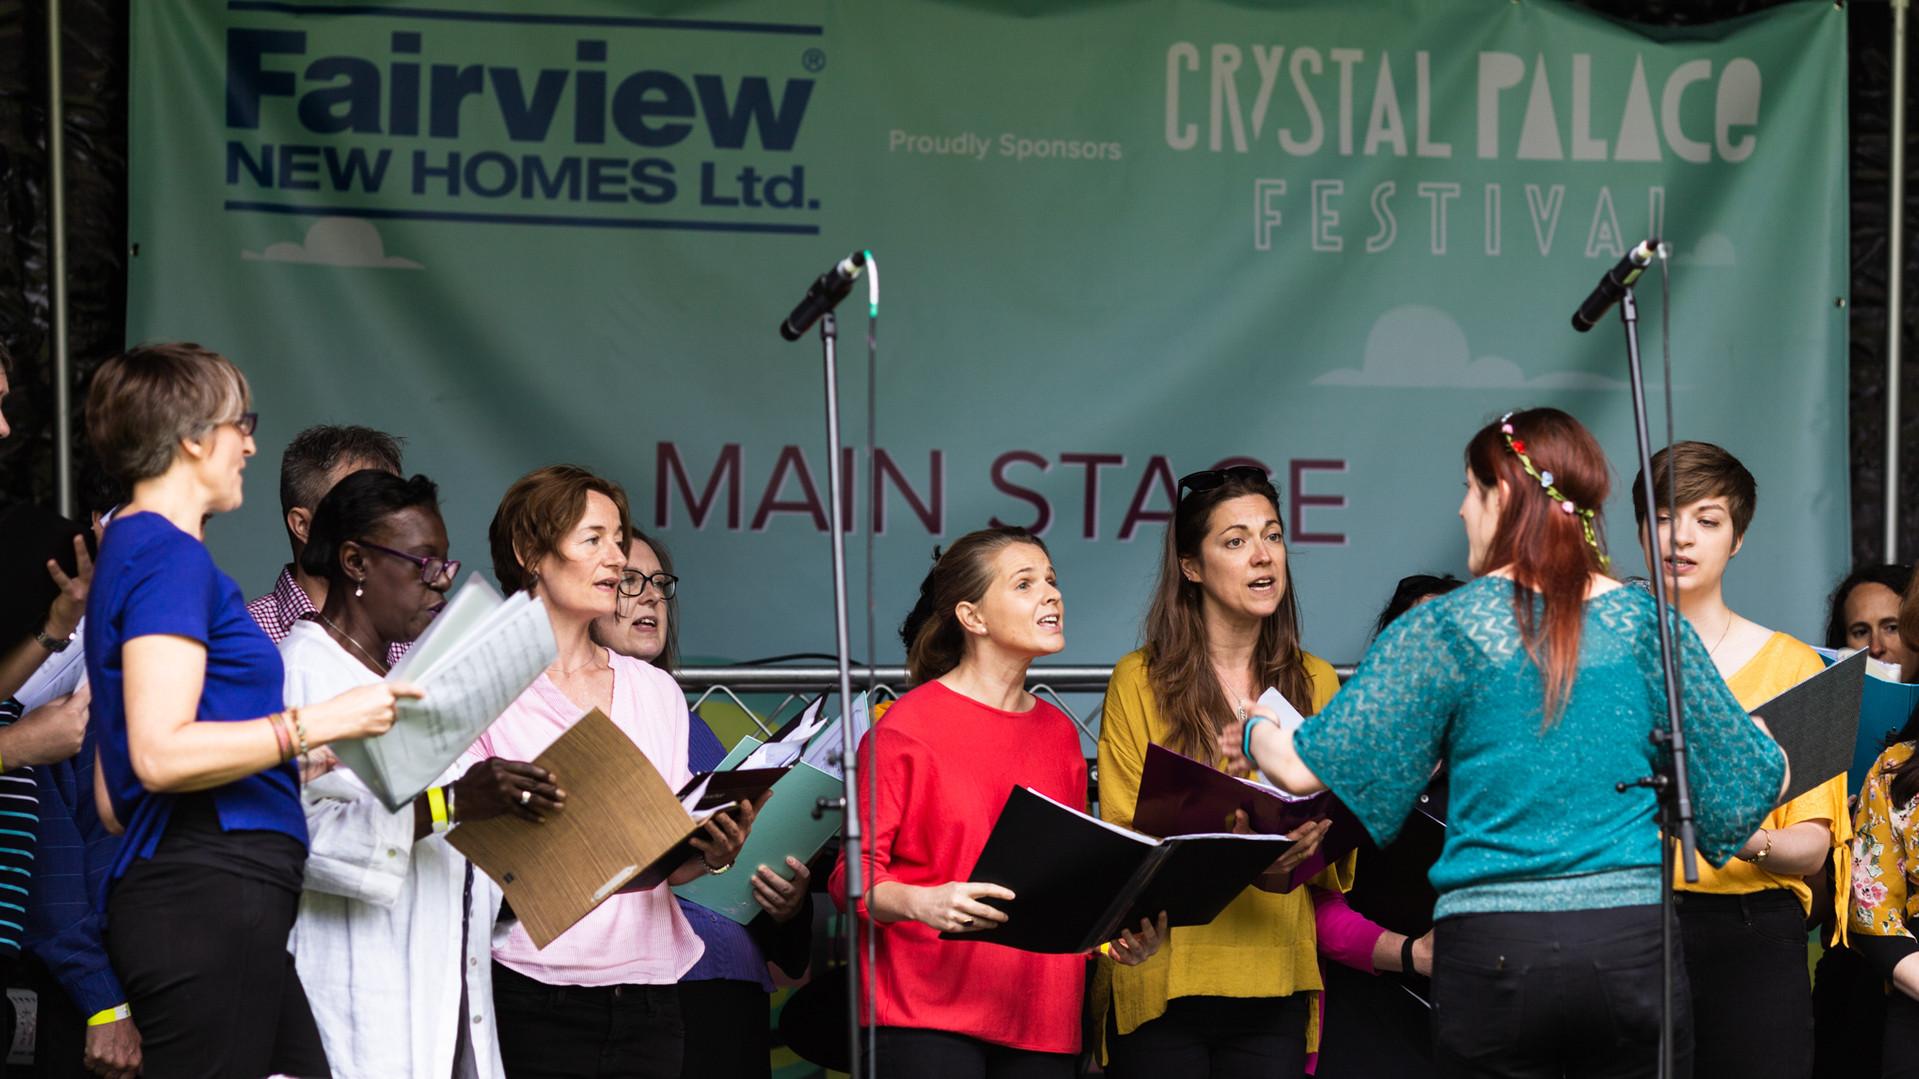 Crystal Palace Festival June 2019